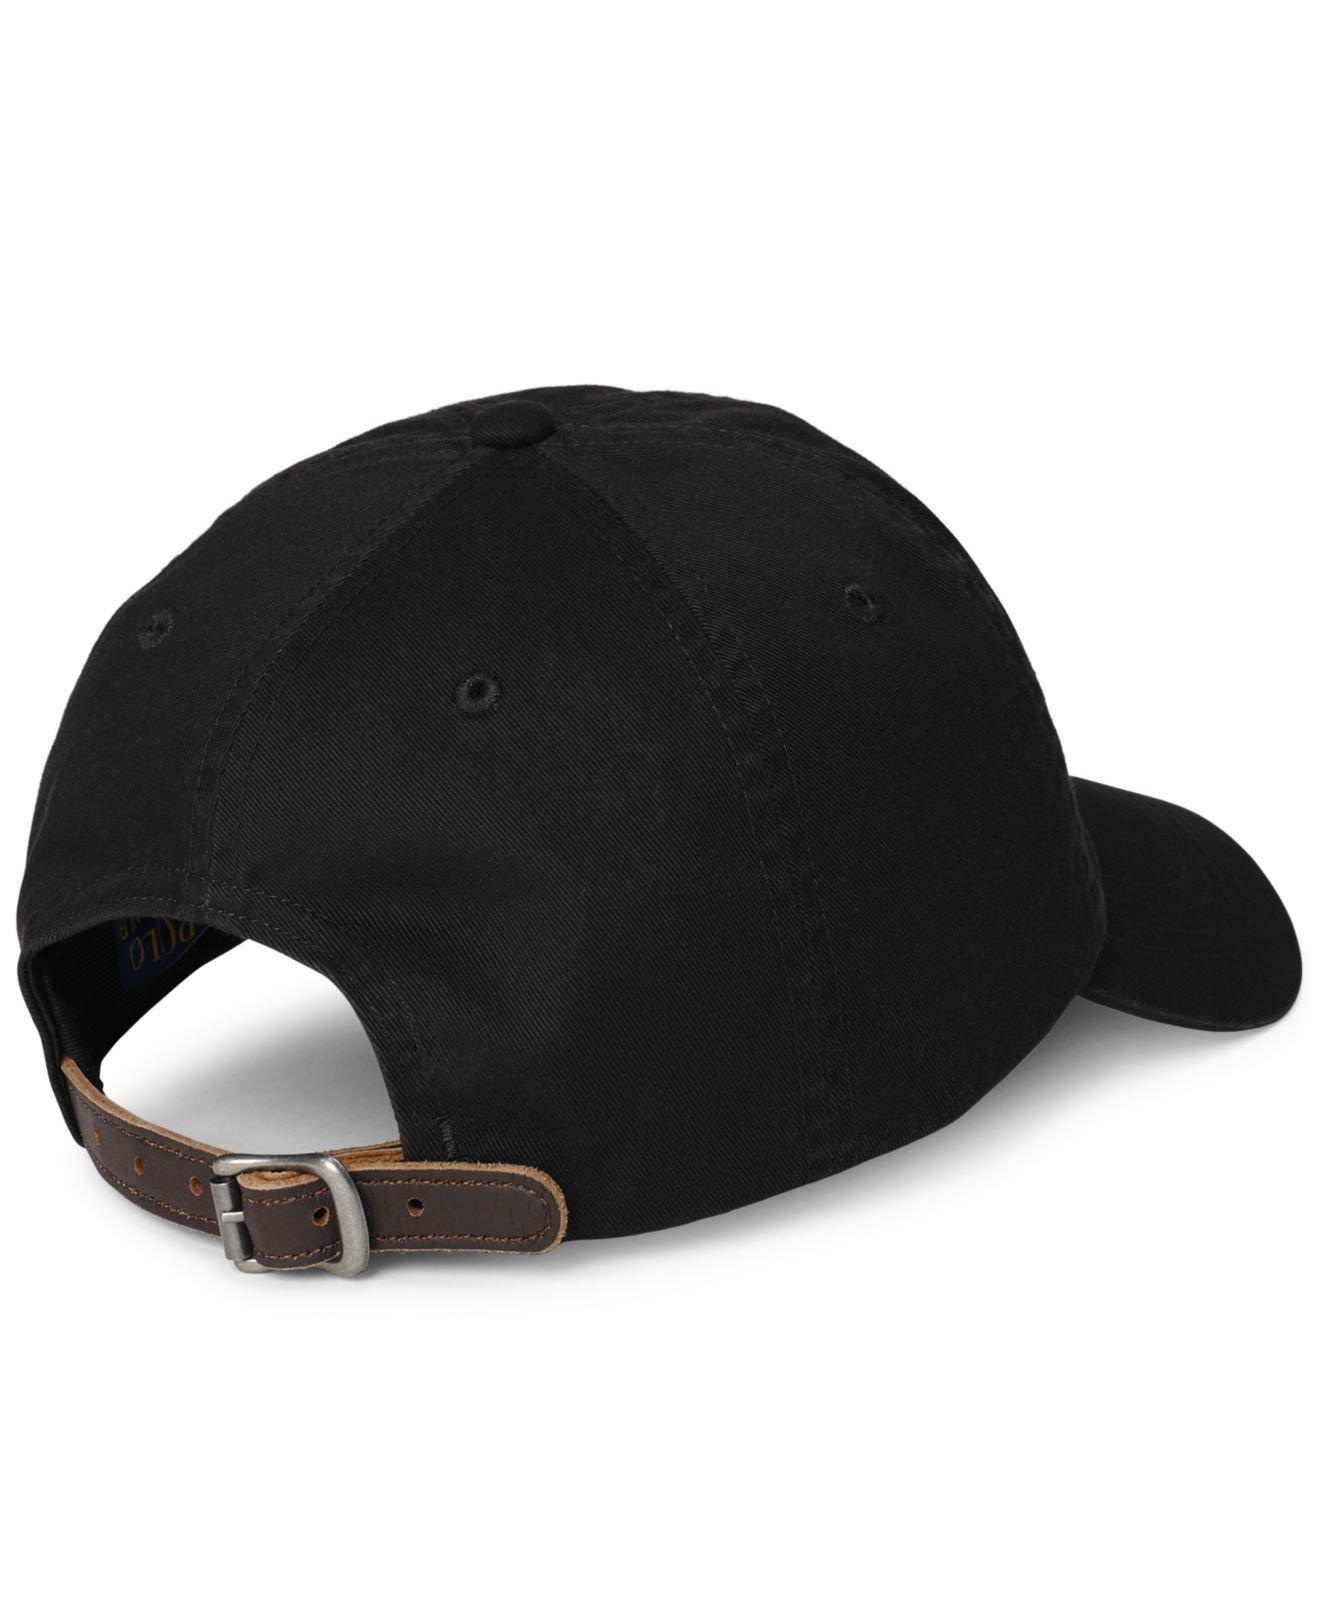 polo ralph lauren men 39 s chino sports cap in black for men. Black Bedroom Furniture Sets. Home Design Ideas